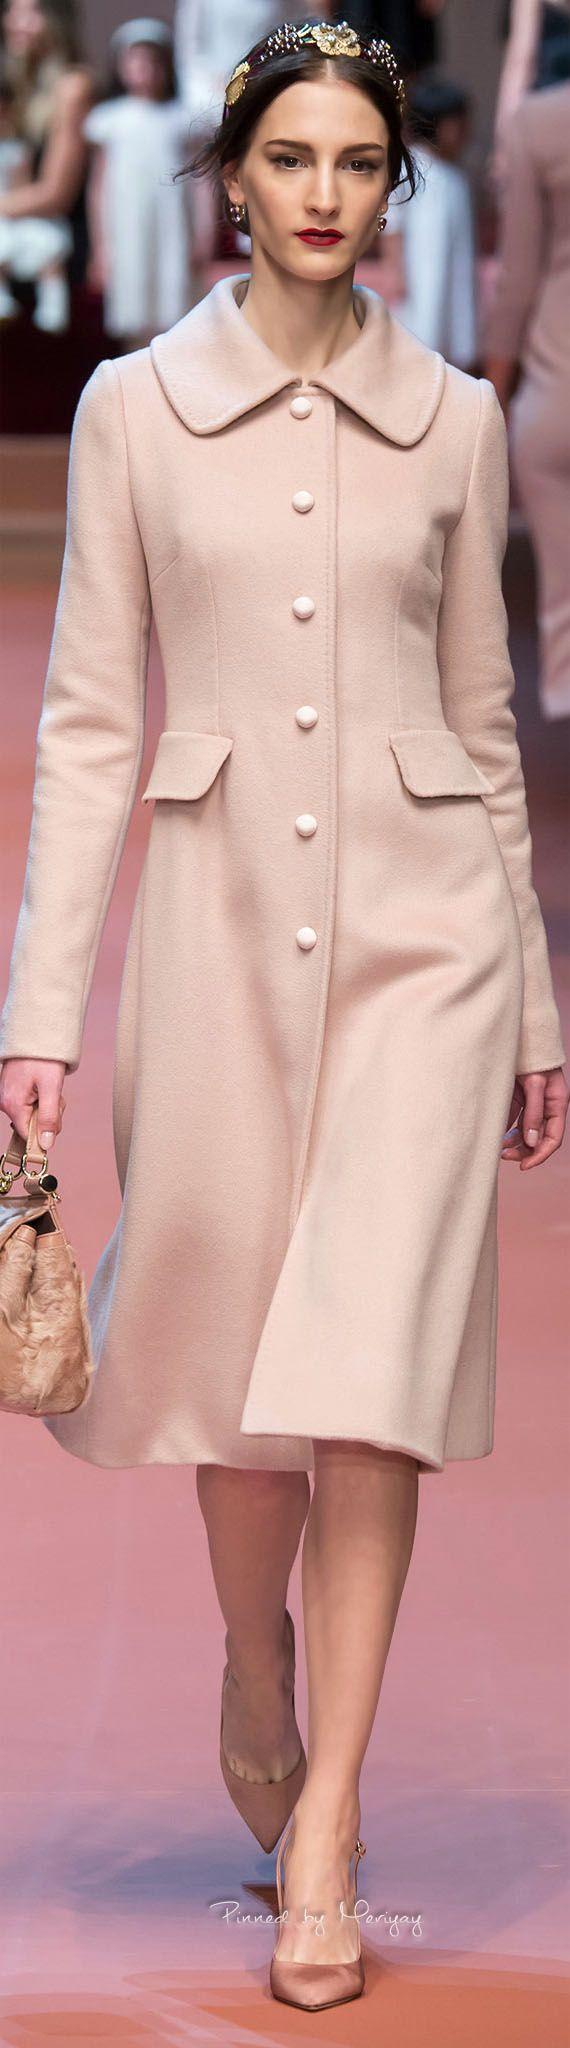 #Farbbberatung #Stilberatung #Farbenreich mit www.farben-reich.com Dolce & Gabbana.Fall 2015.